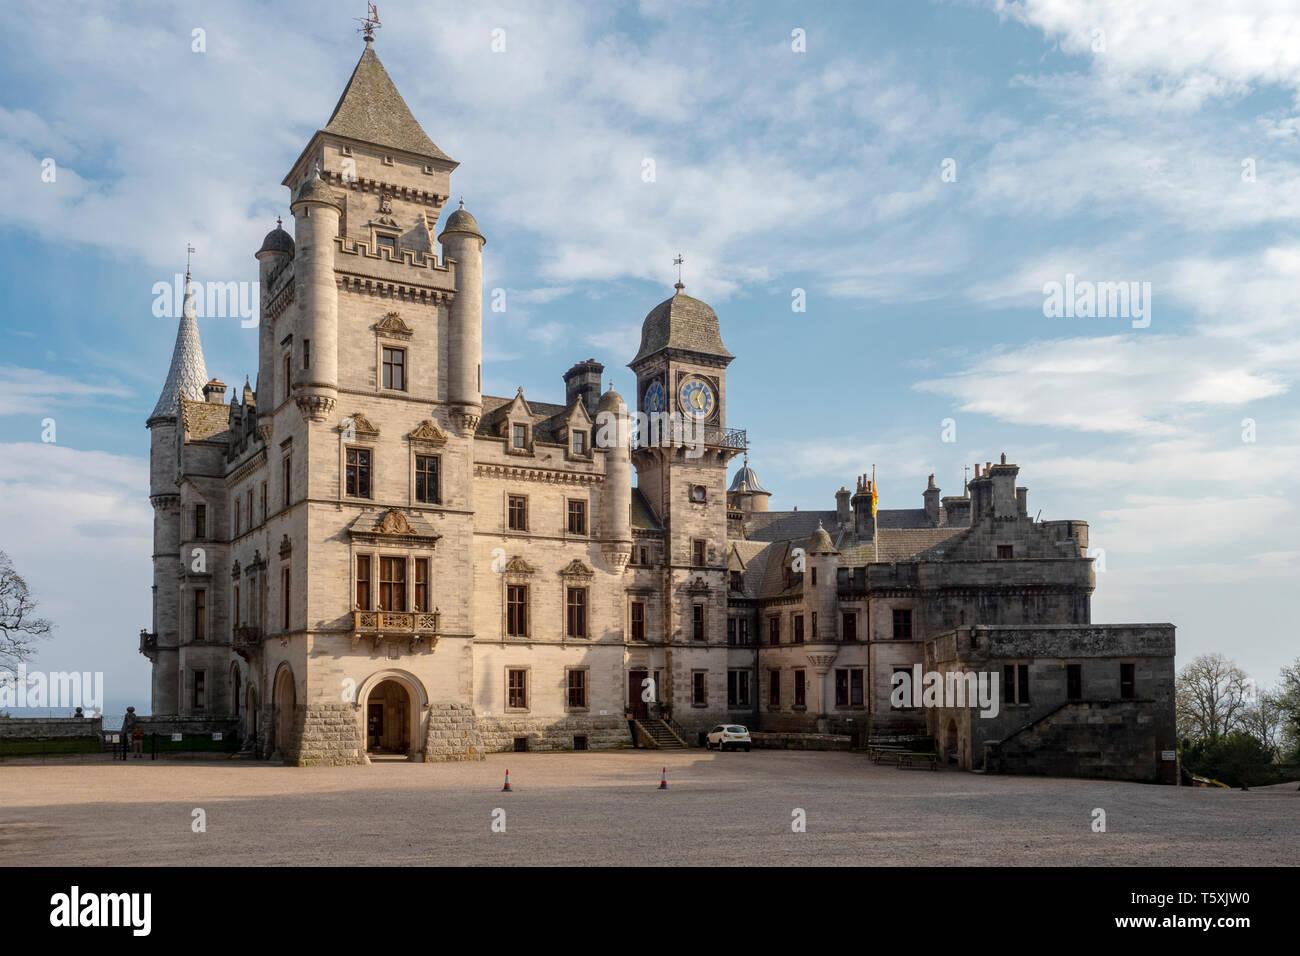 Dunrobin Castle, Scotland Stock Photo